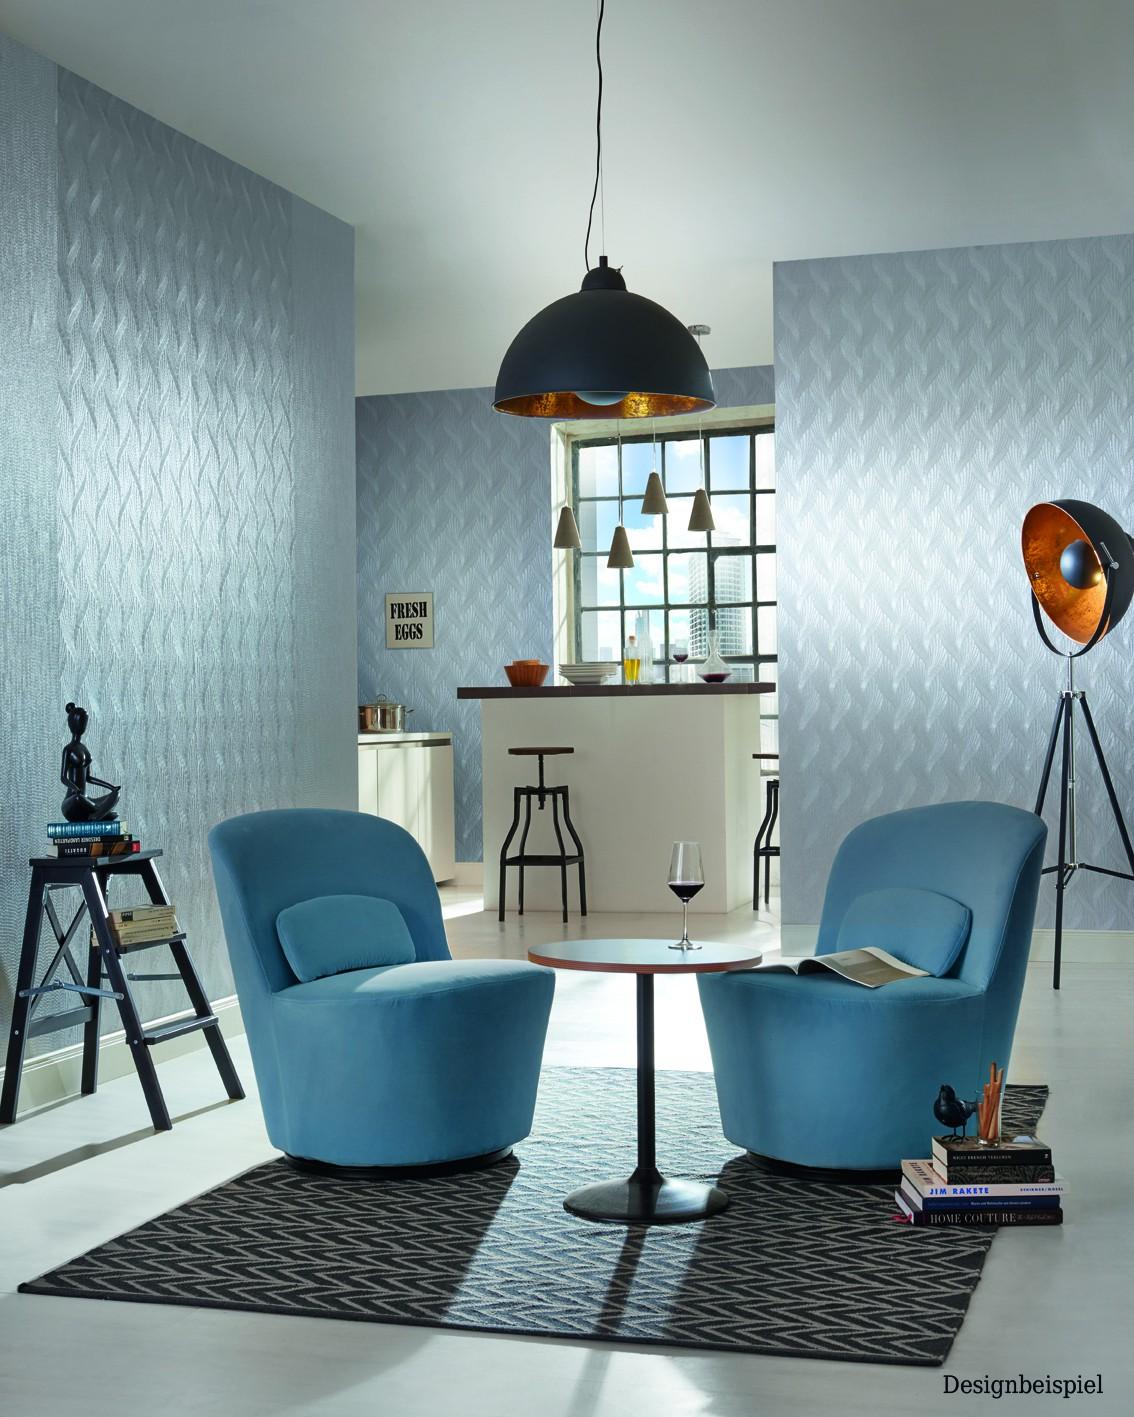 vliestapete beige grafisch dieter bohlen 02445 30. Black Bedroom Furniture Sets. Home Design Ideas